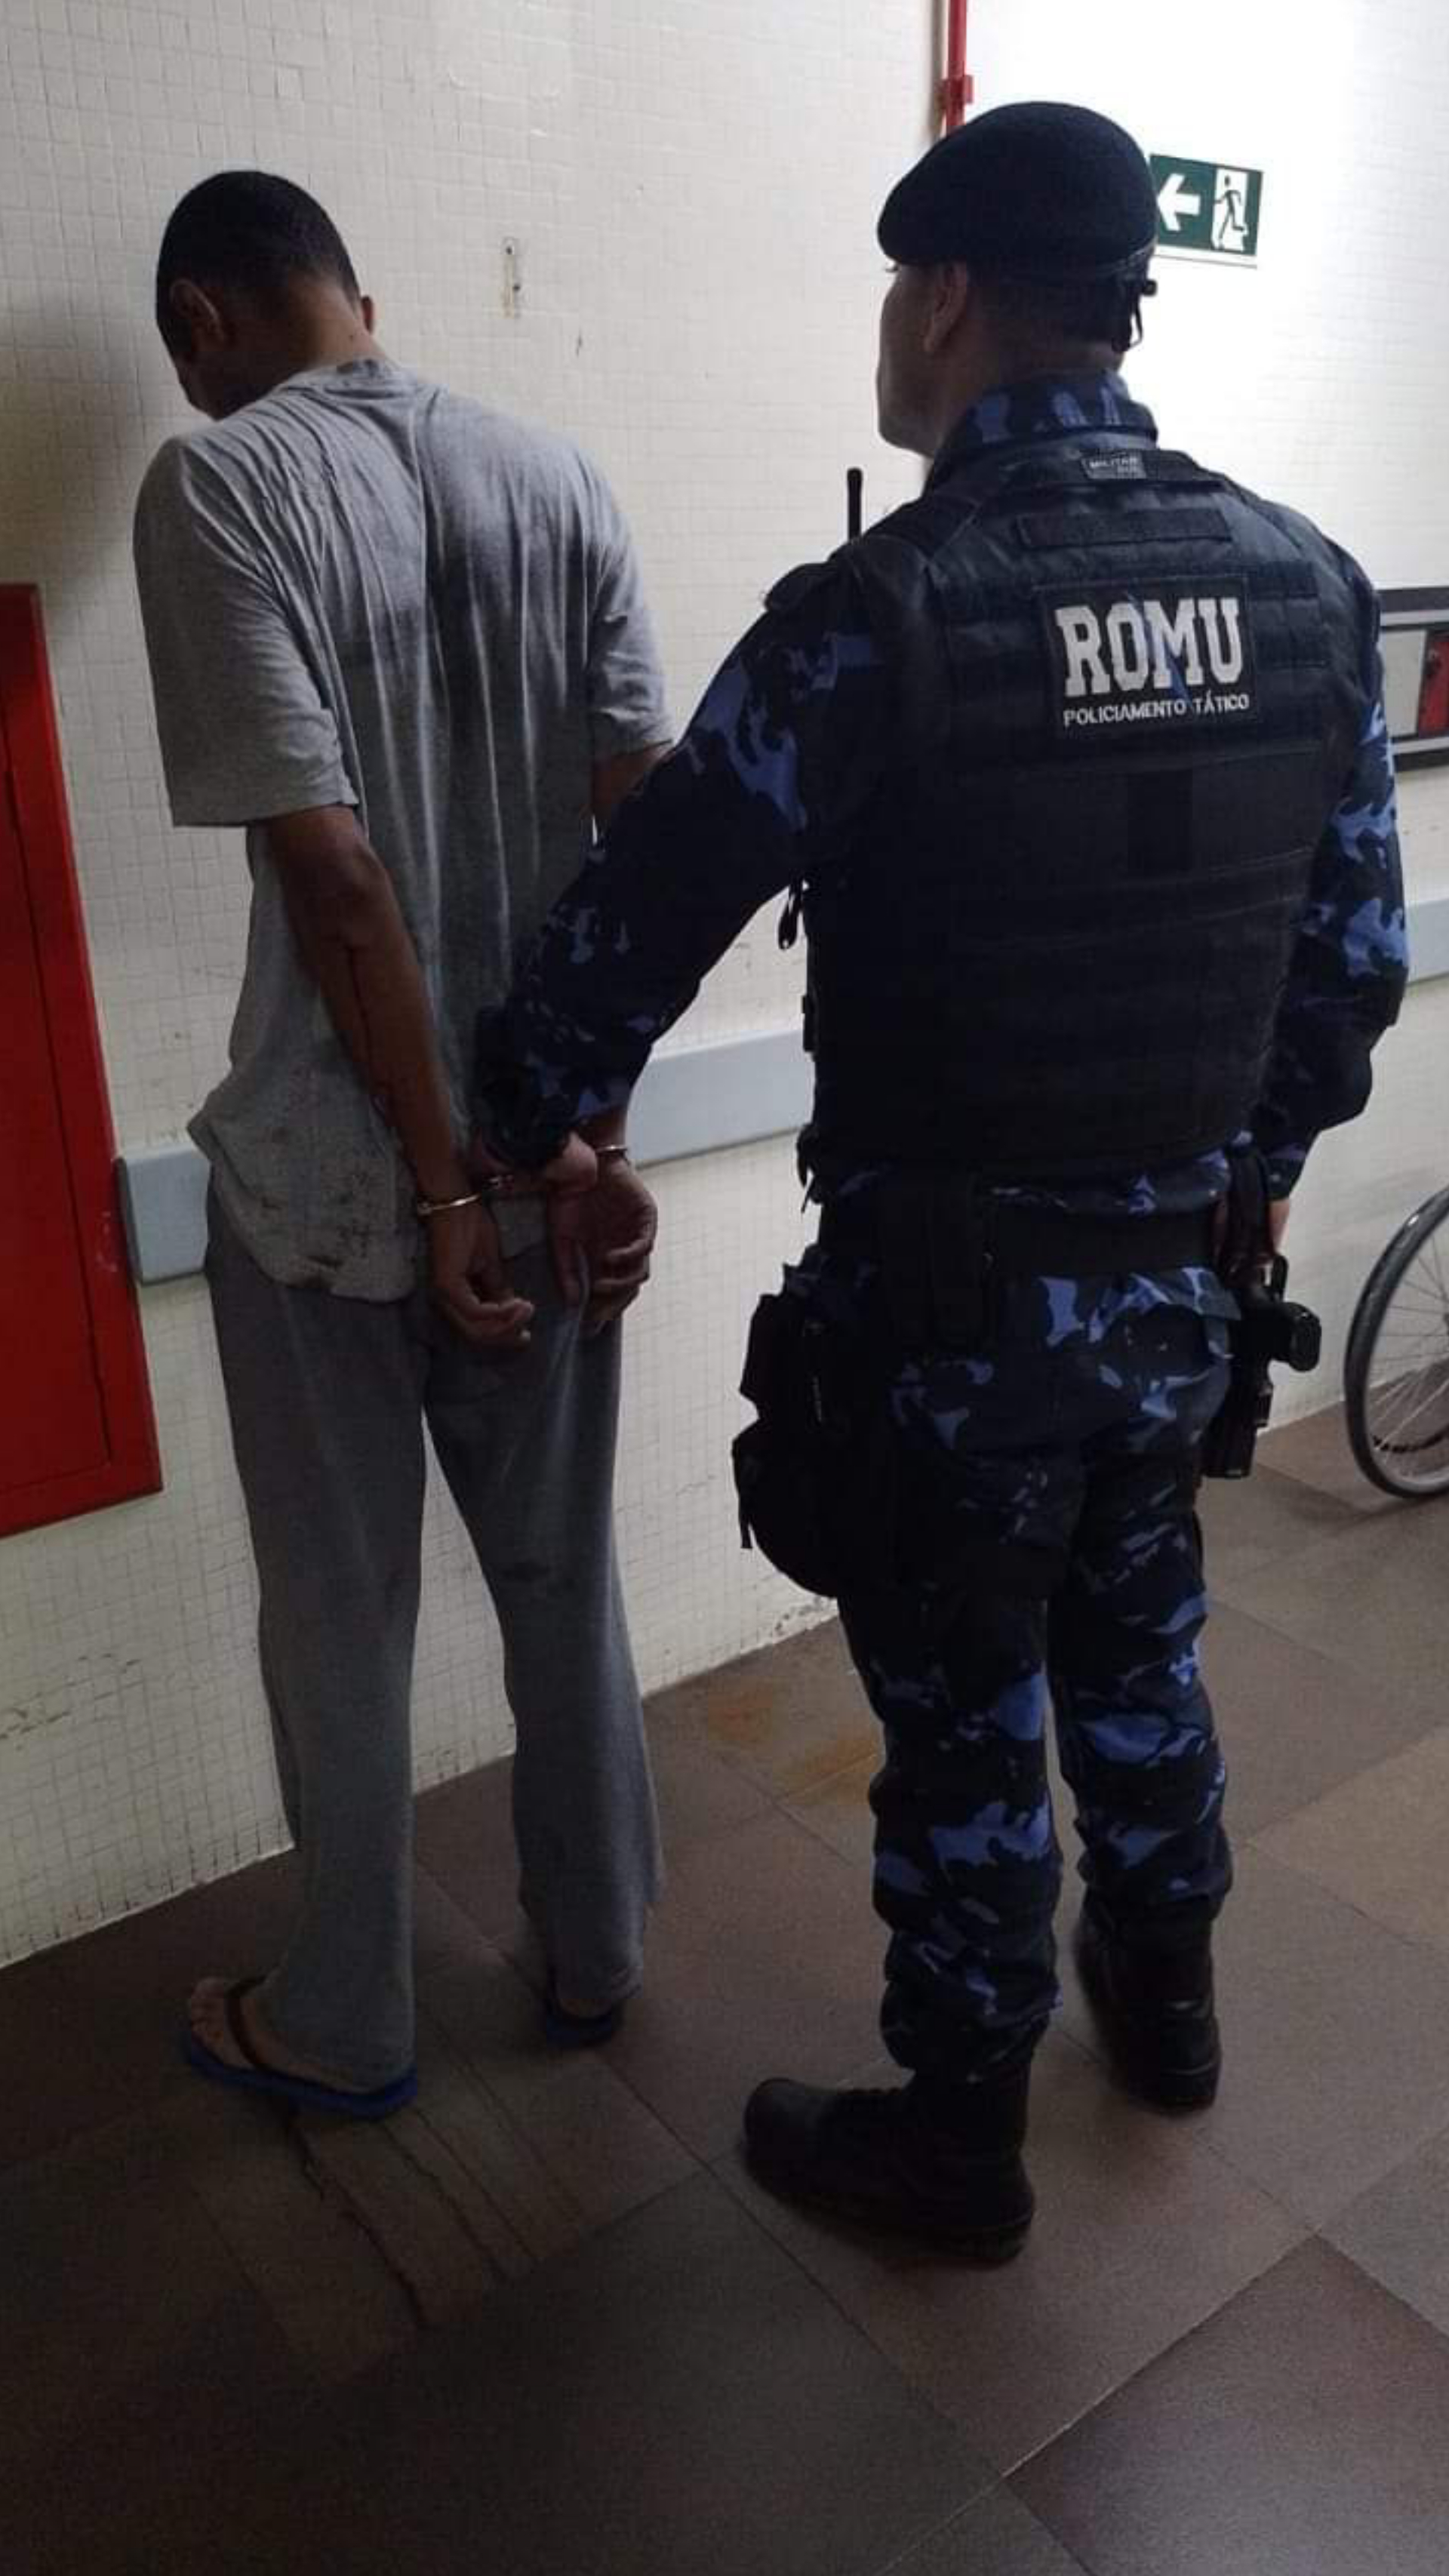 O Covarde Fdp sendo preso pela ROMU. Parabéns, Guerreiros!